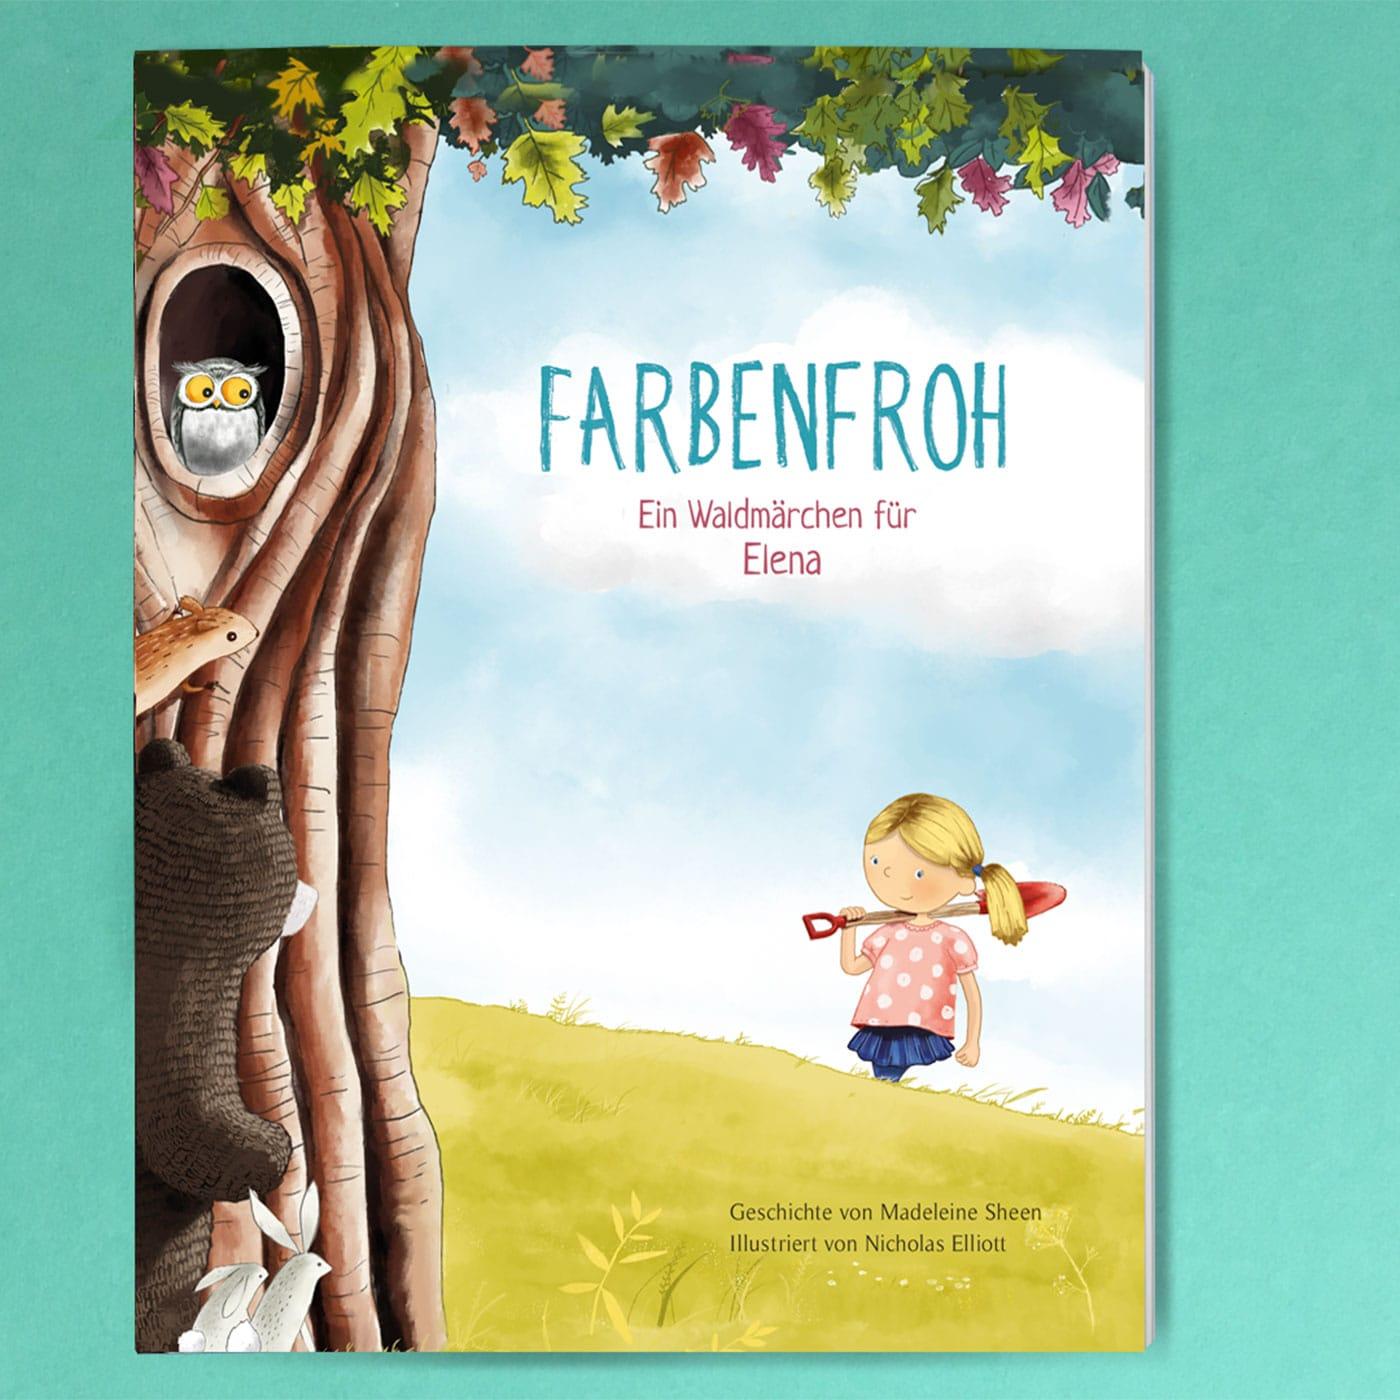 Kinderbuch individualisieren: Farbenfroh // HIMBEER